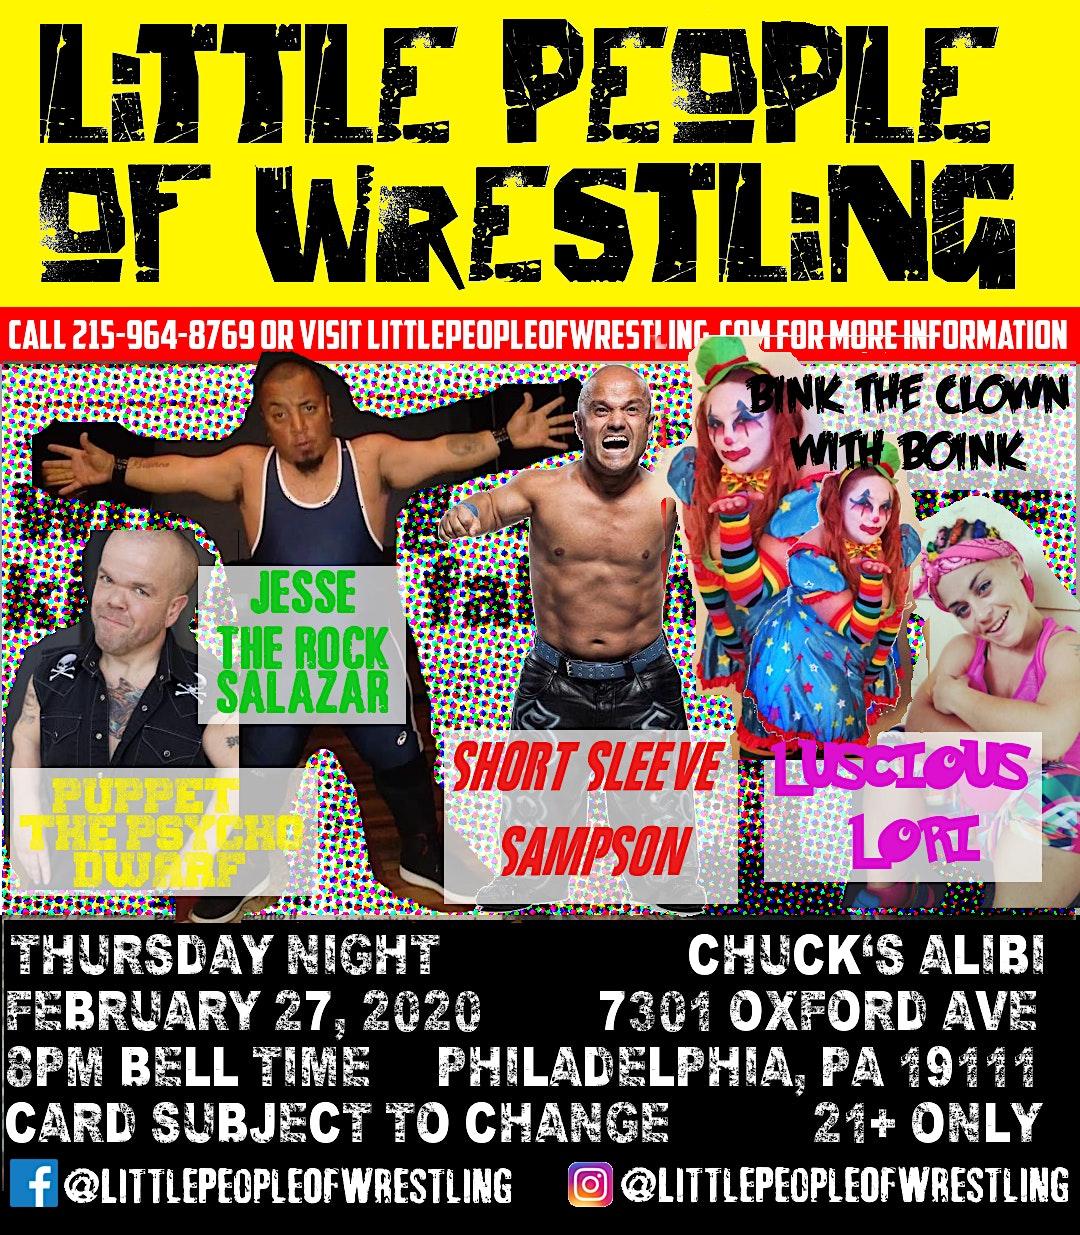 Little People of Wrestling